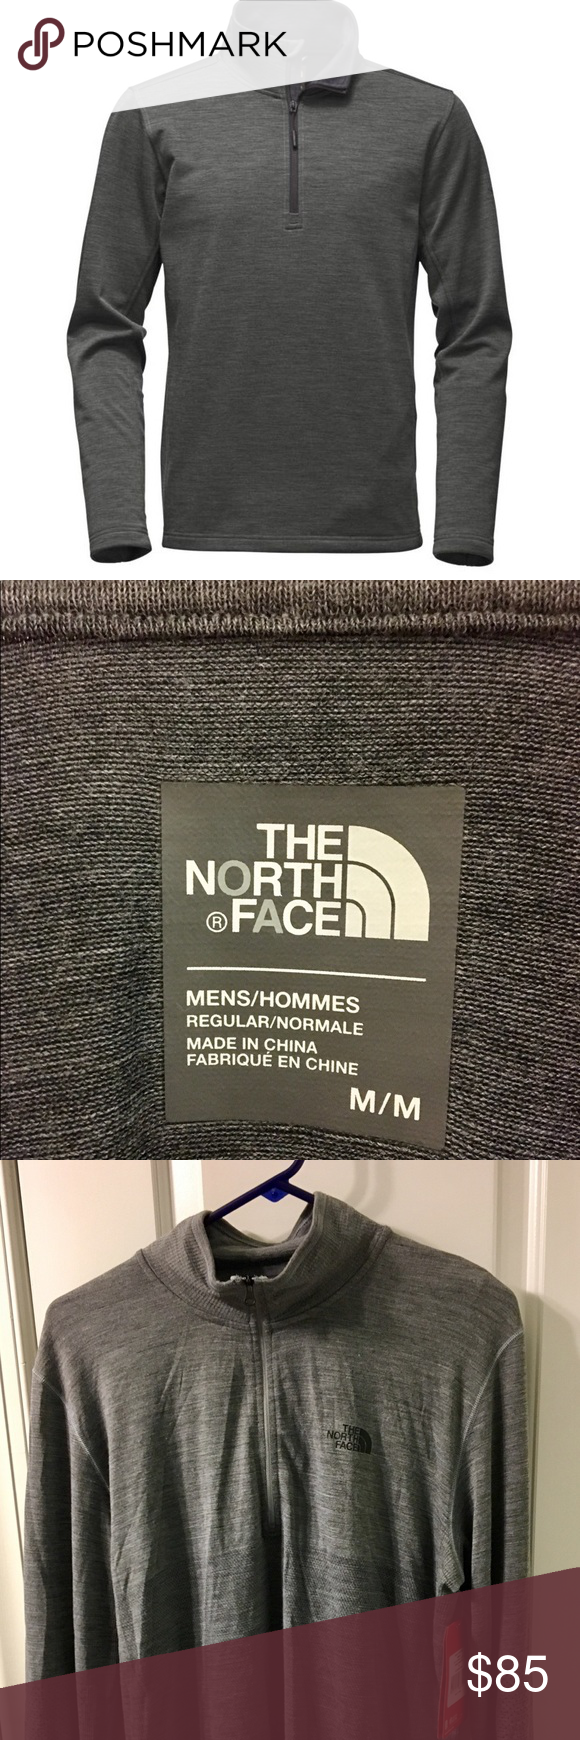 226d434b2 North Face Men's Flashdry Wool 1/4 Zip NWT | My Posh Closet ...